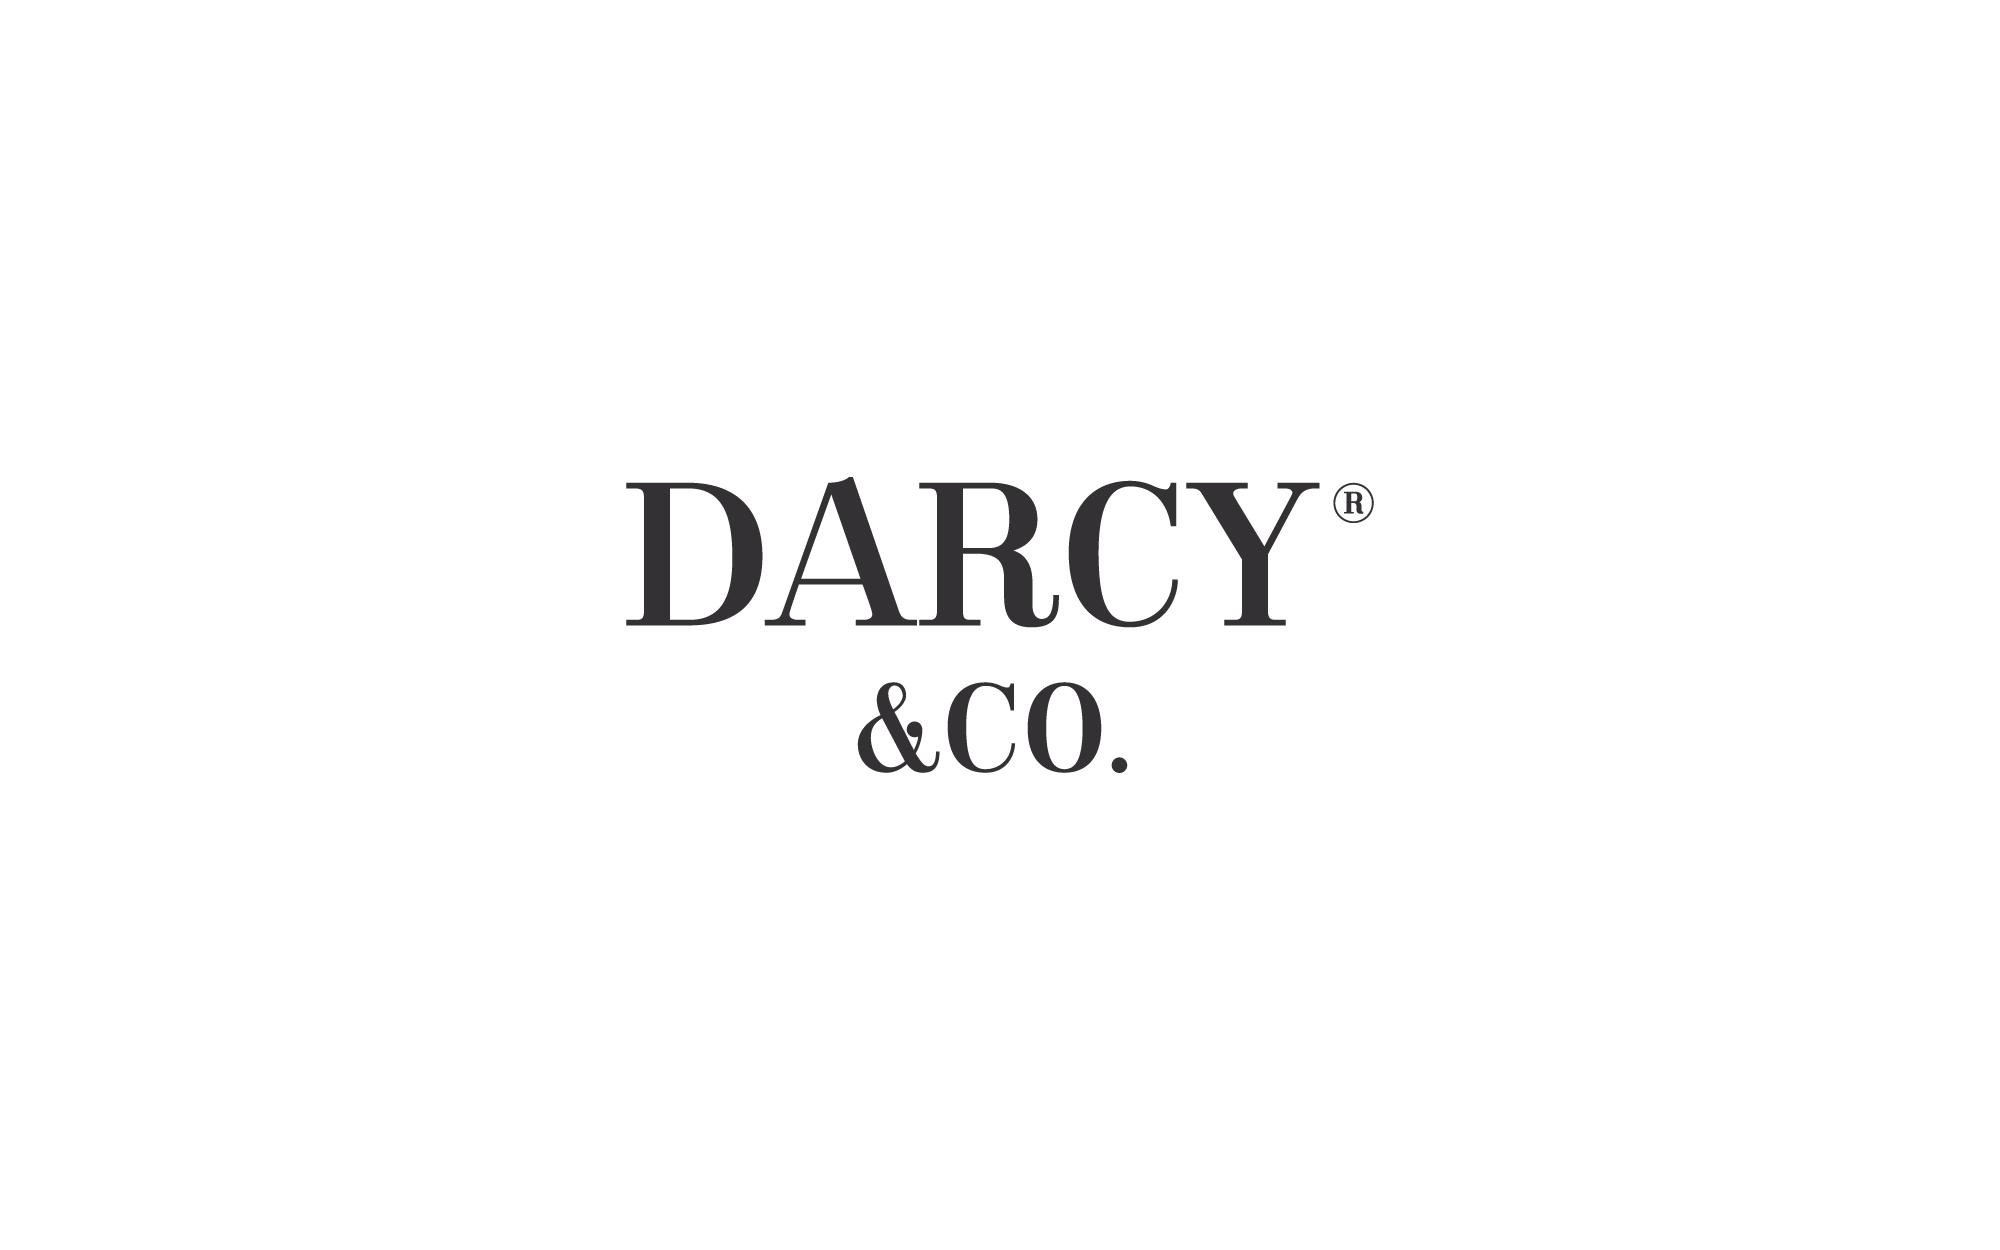 darcy_co_logo_branding_design_matthew_pomorski_graphic_designer_kent